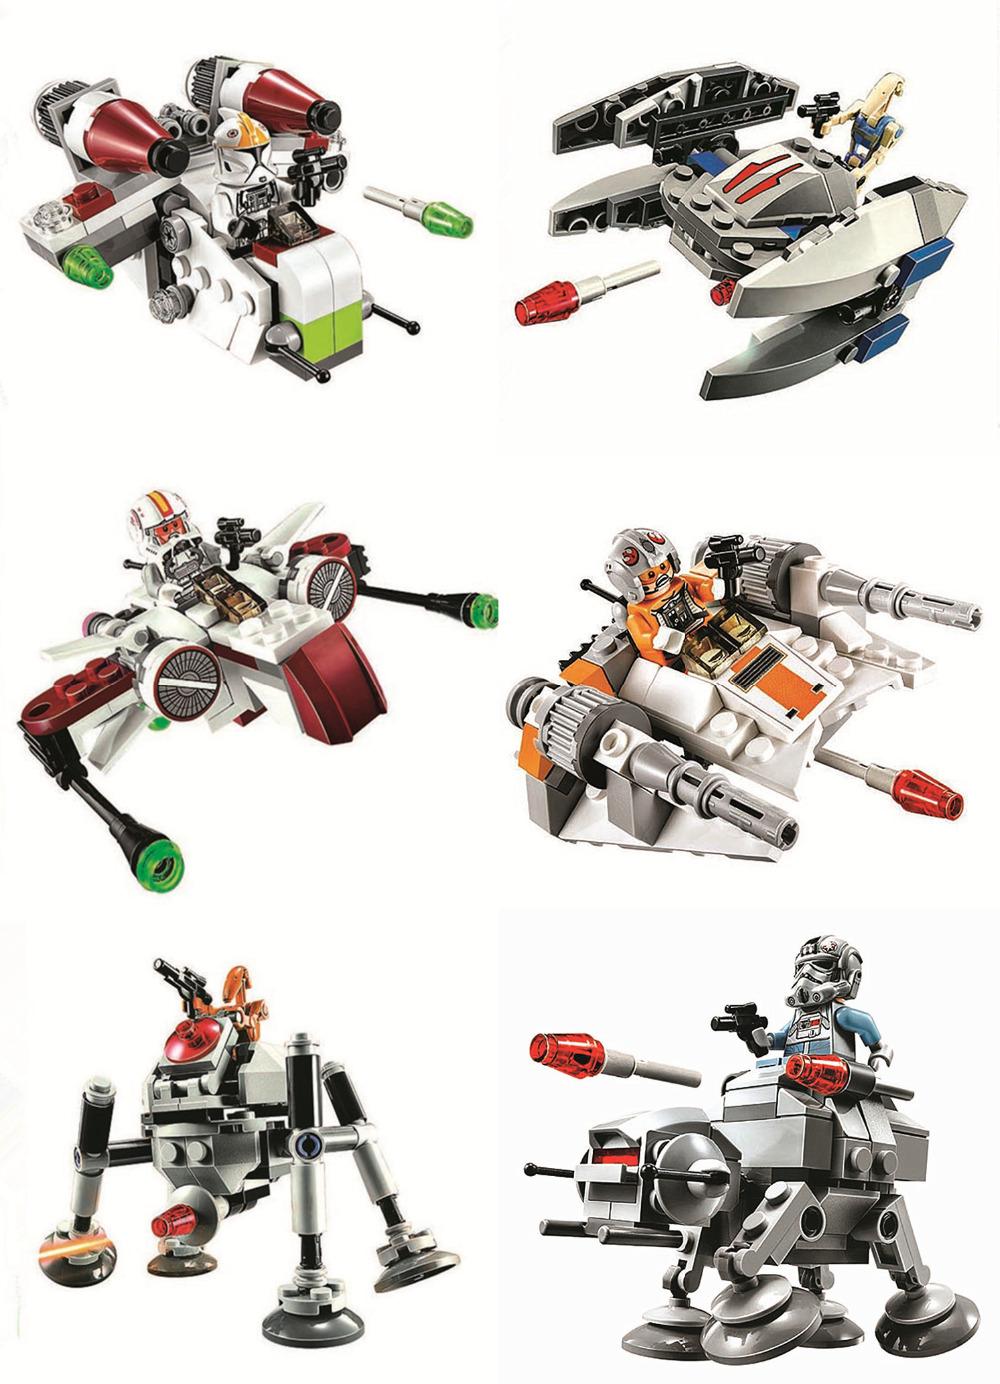 Bela 10359 Stars Wars The Avengers Starfighter Minifigures 6pcs/lot Building Blocks Set Model Toys Compatible With Legoe 75072